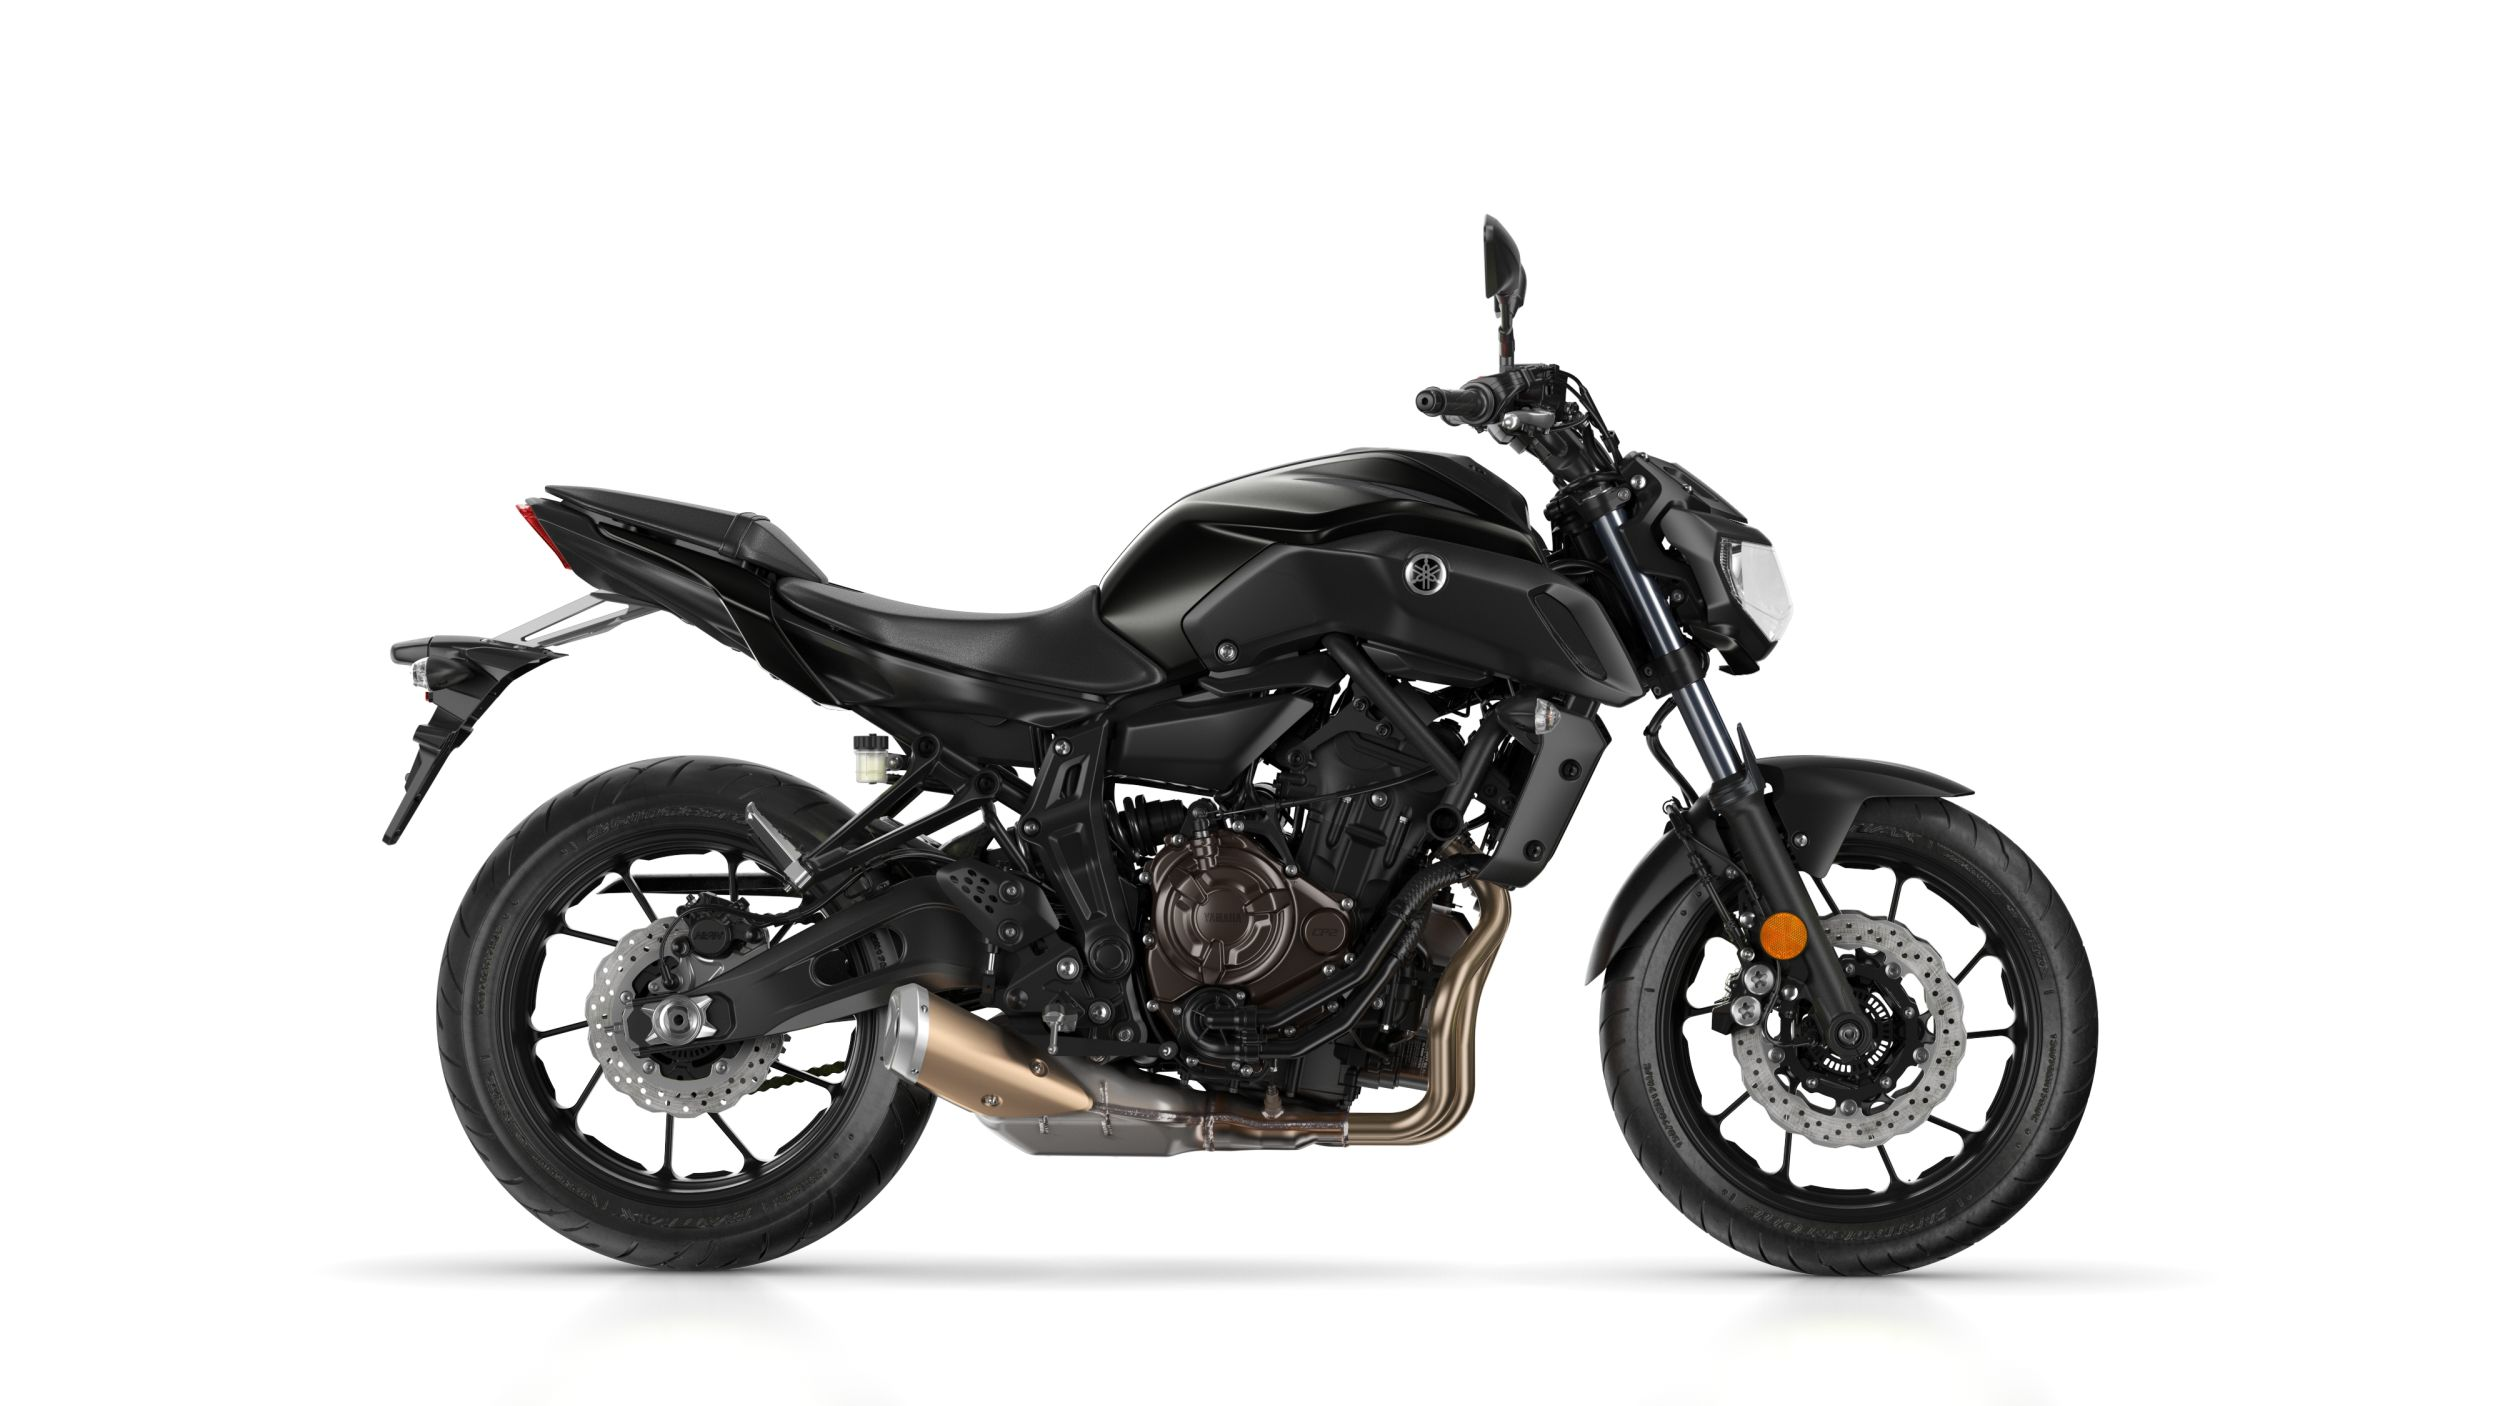 yamaha modelle motorrad zweirad mildner 08056. Black Bedroom Furniture Sets. Home Design Ideas